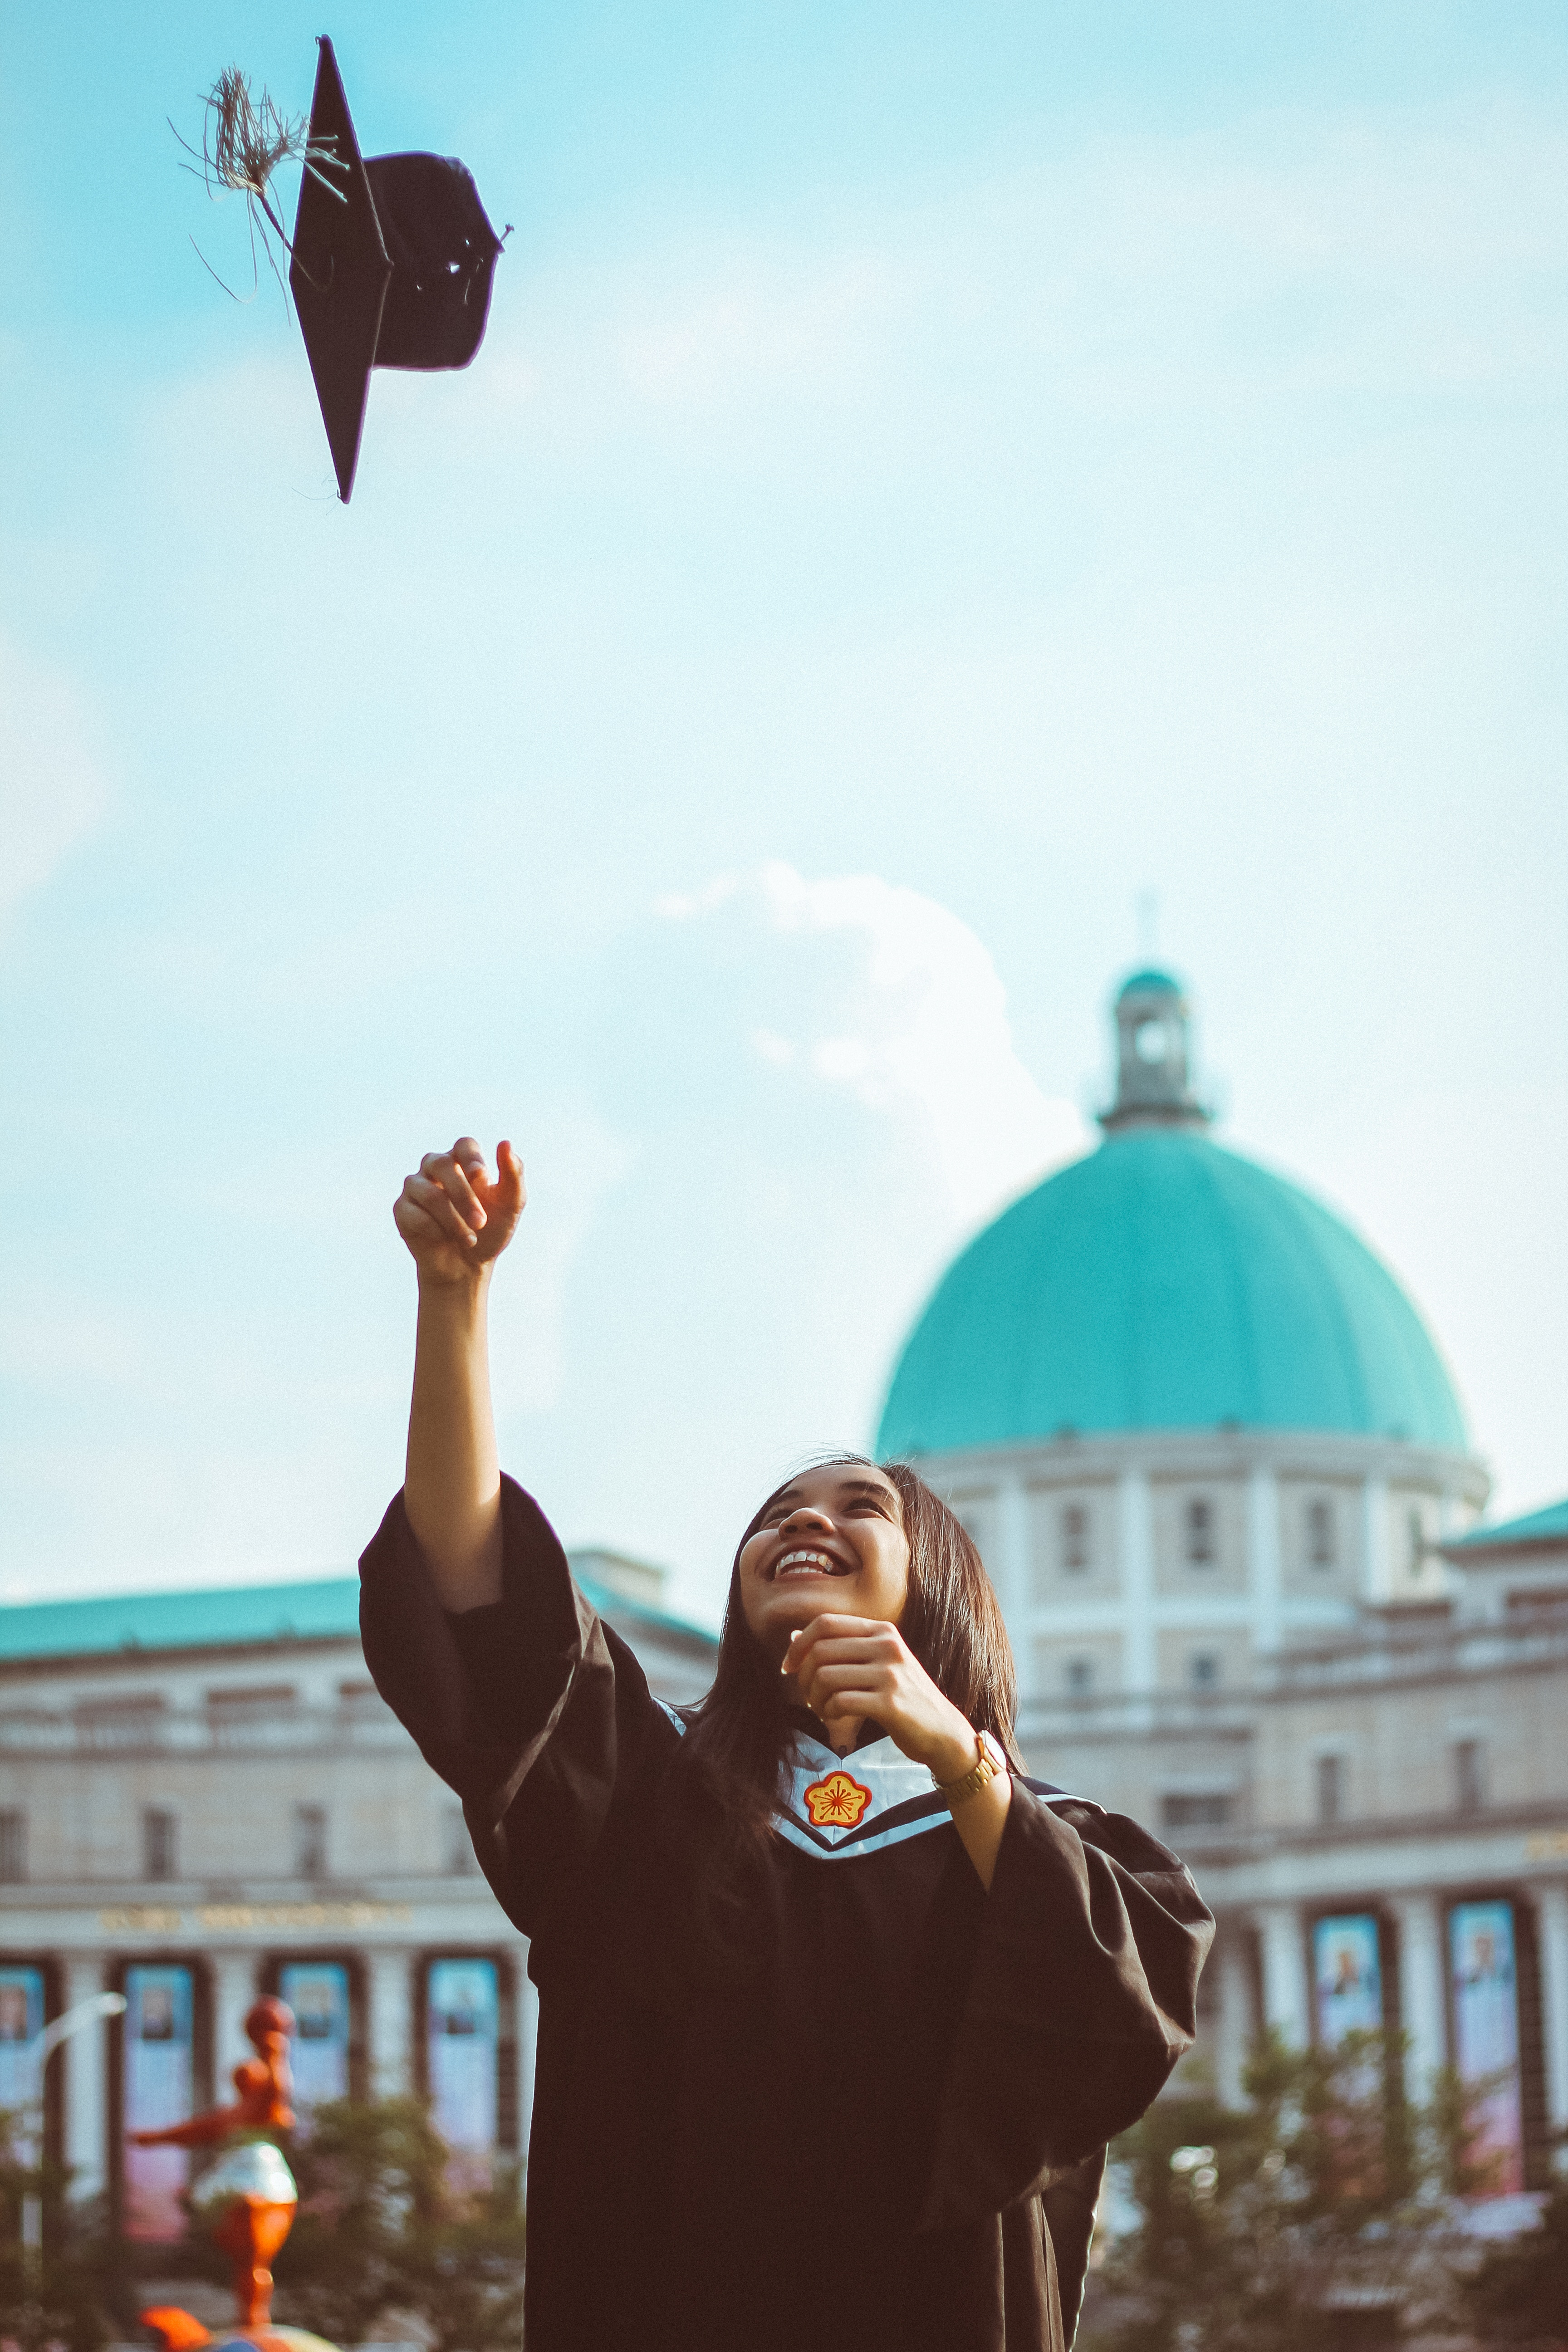 Graduation. ESL student success starts with creating an esl program that works